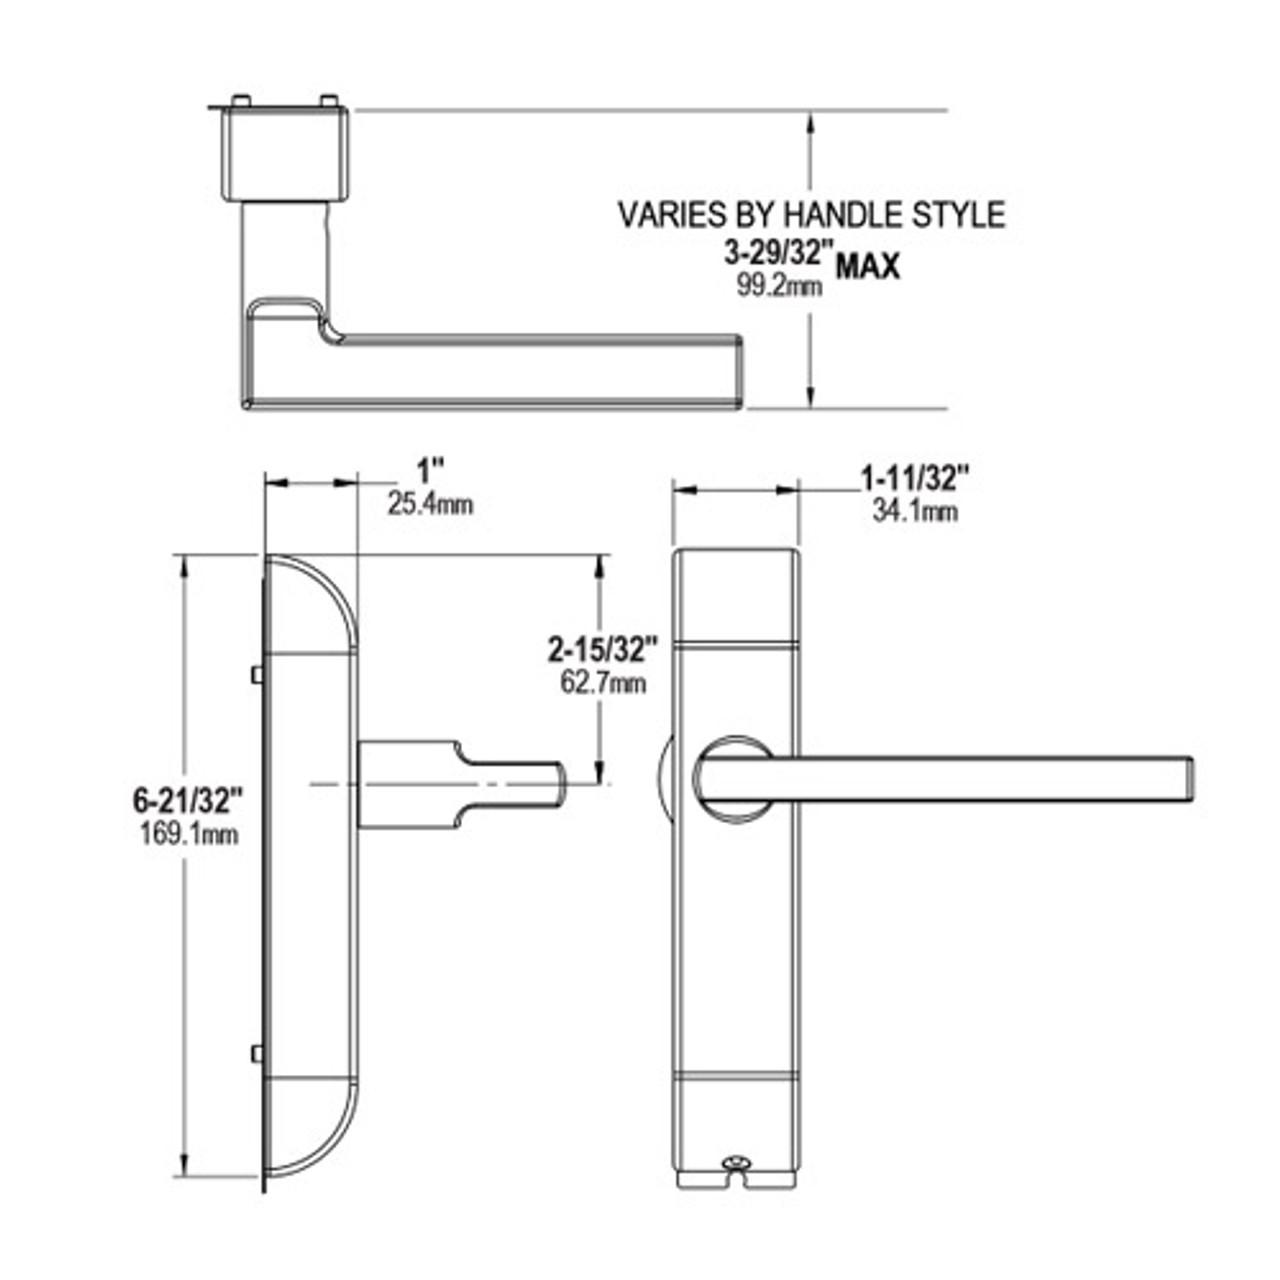 4600-MI-521-US10B Adams Rite MI Designer handle Dimensional View